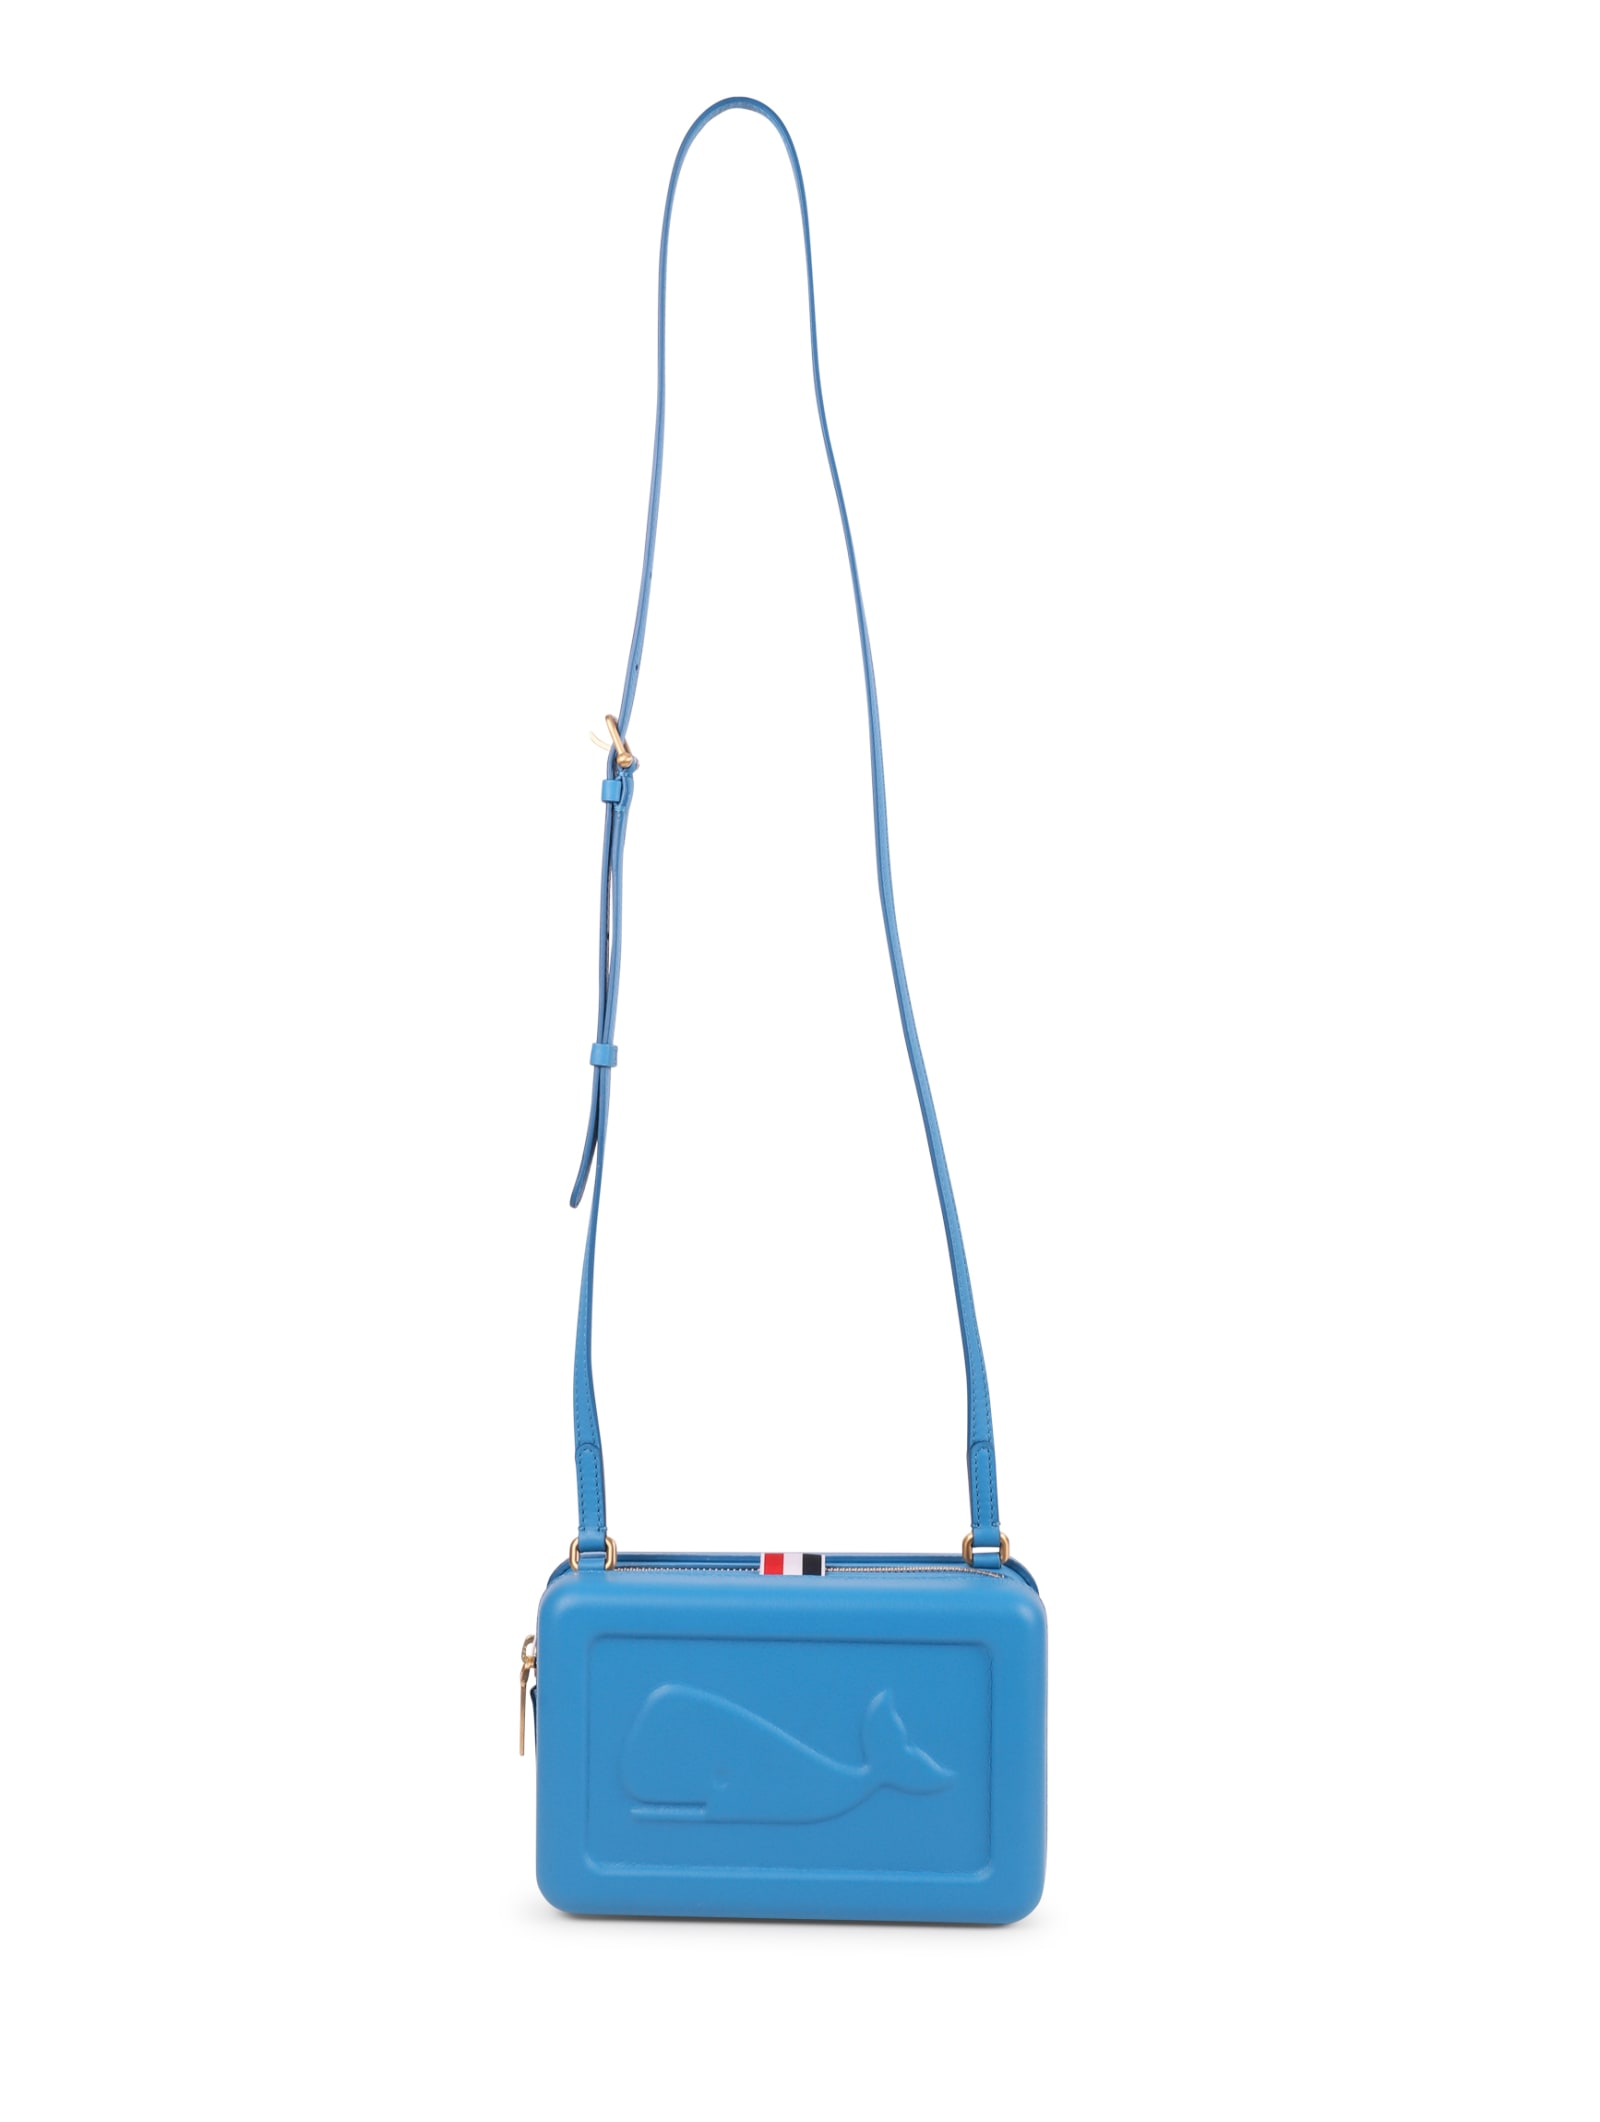 Thom Browne Blue Whale Crossbody Bag